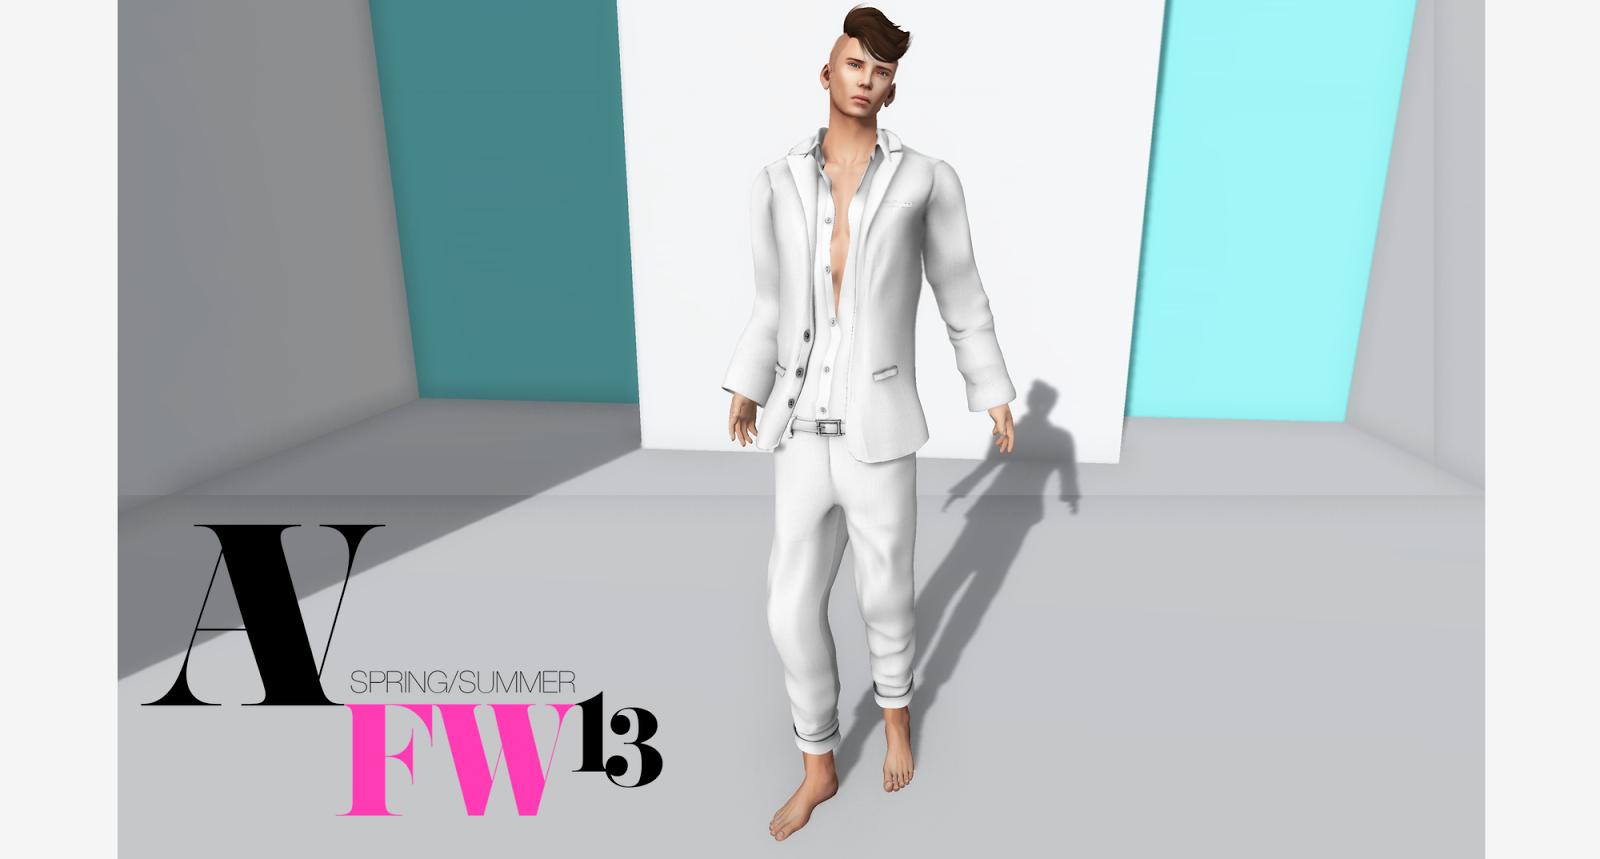 AVENUE S/S Fashion Week 2013